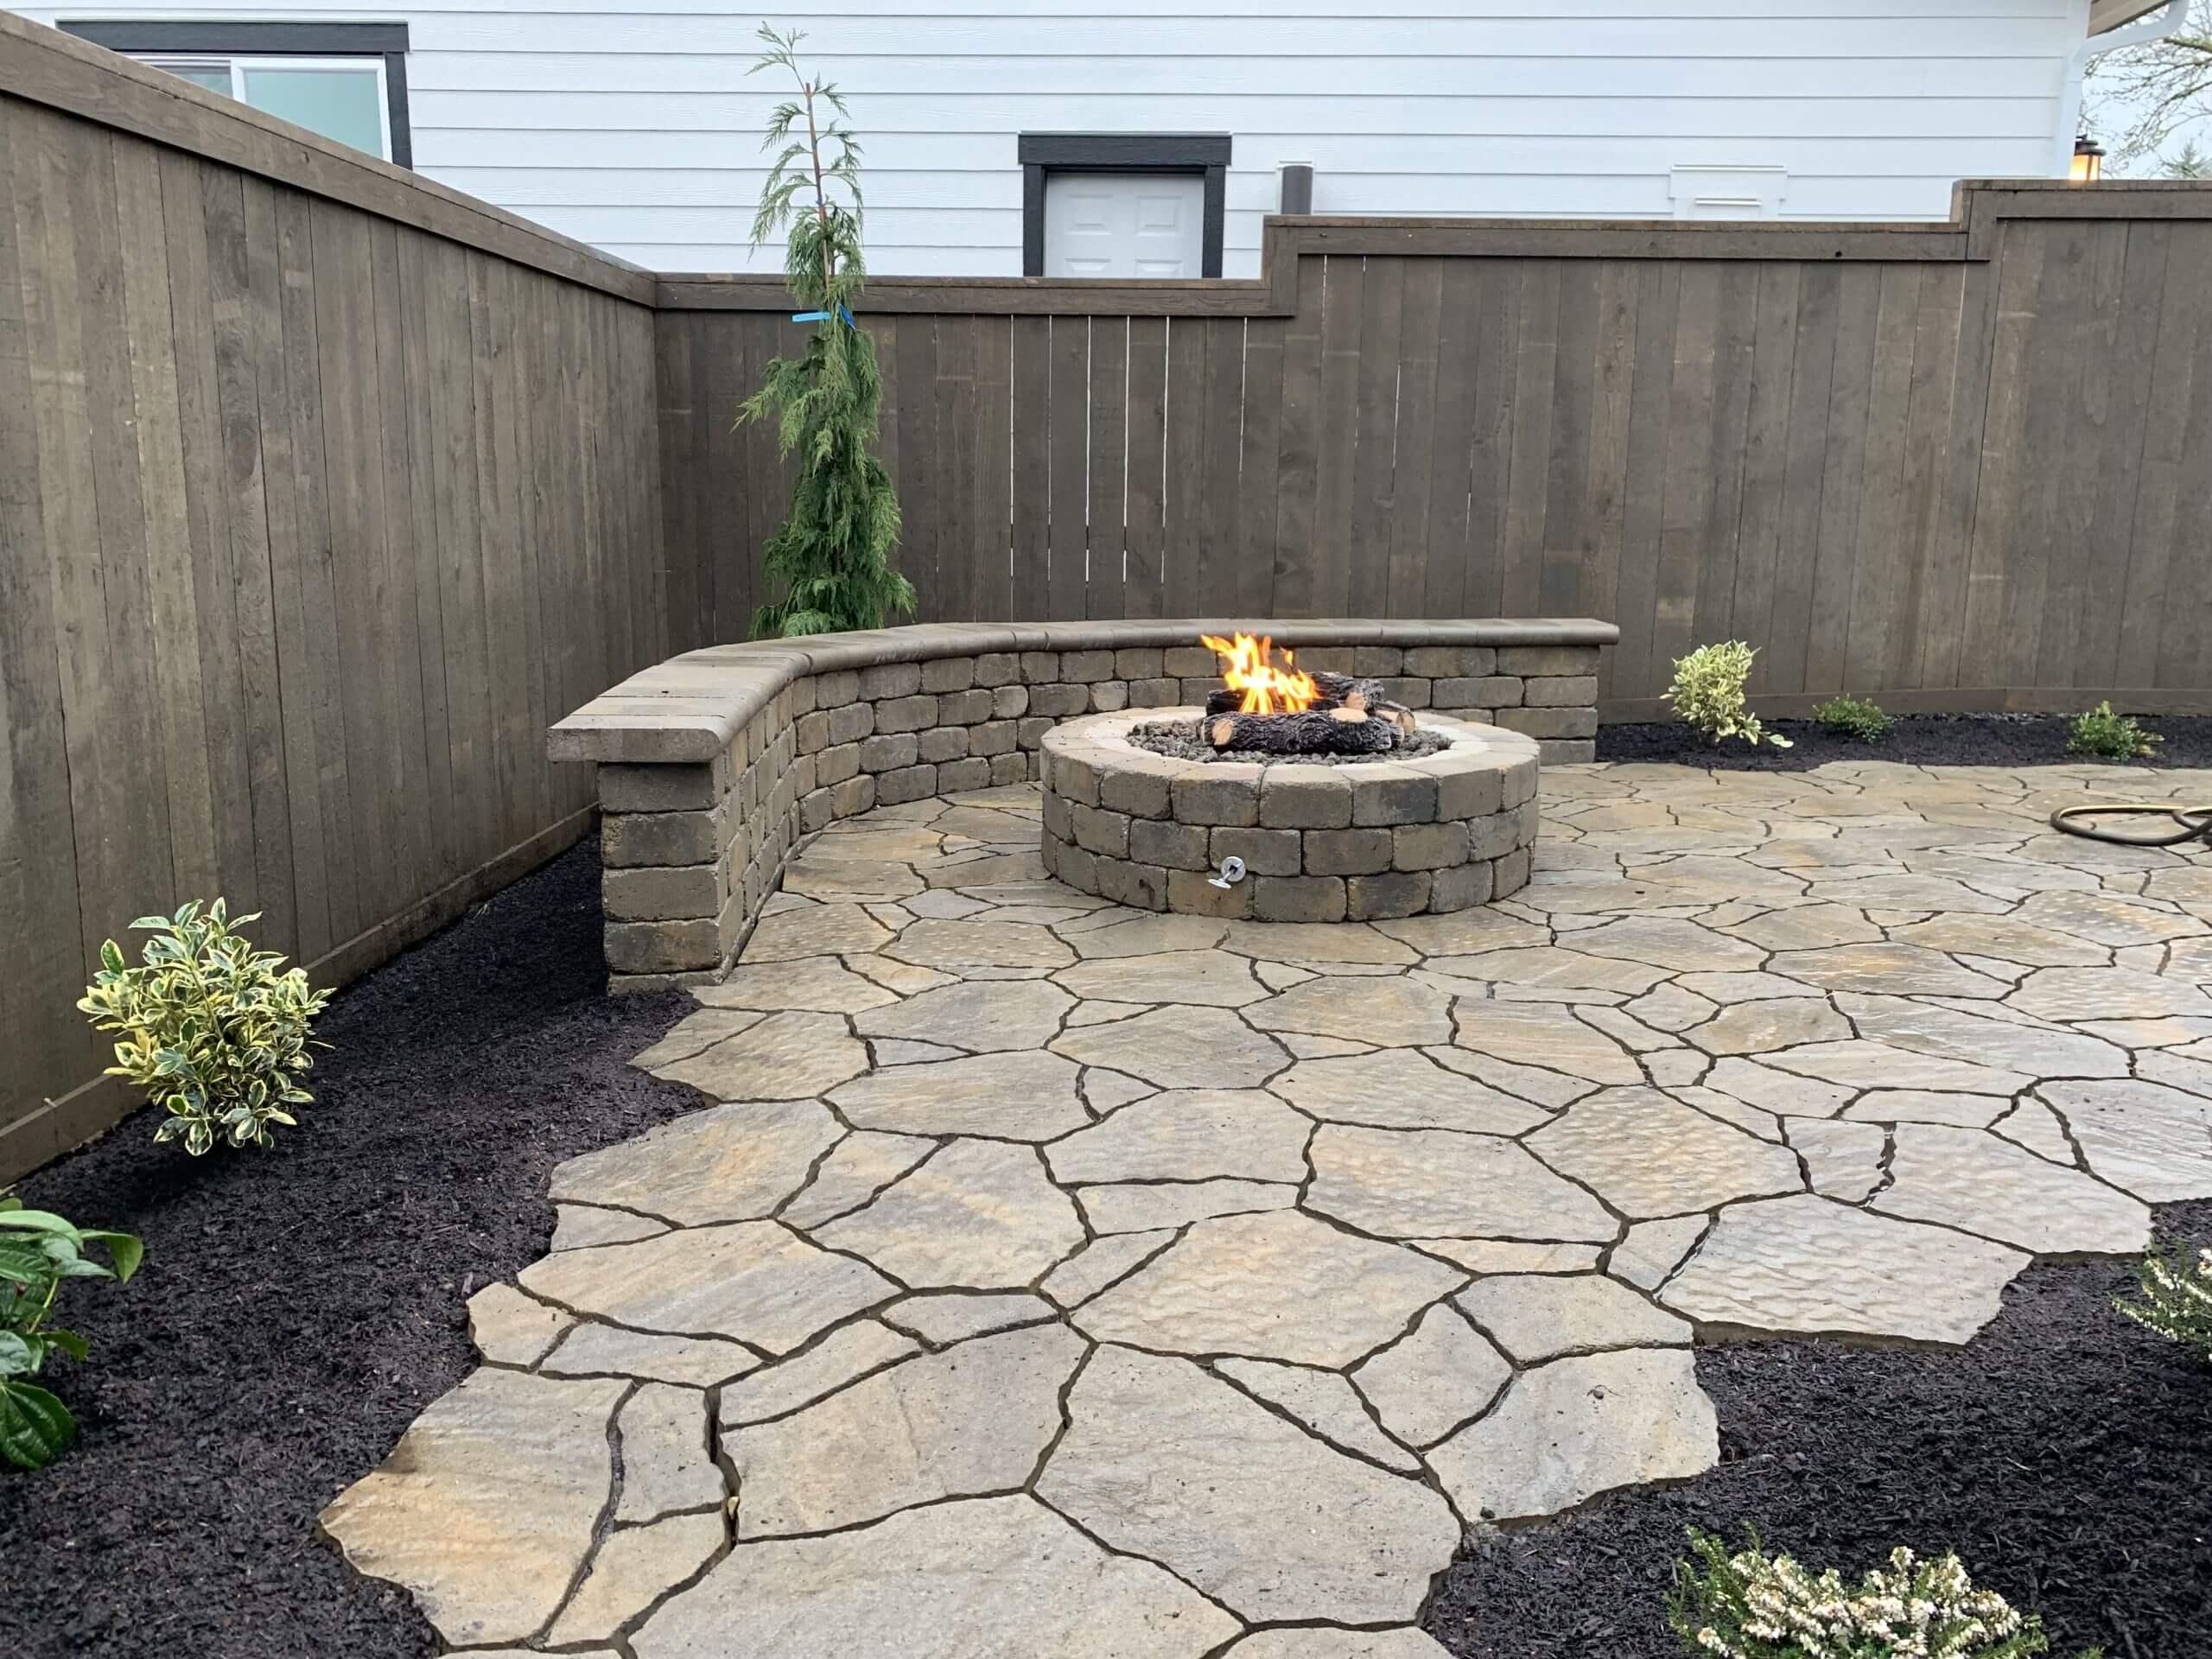 https://shovelandthumb.sfo3.digitaloceanspaces.com/patios walkways/patio 5